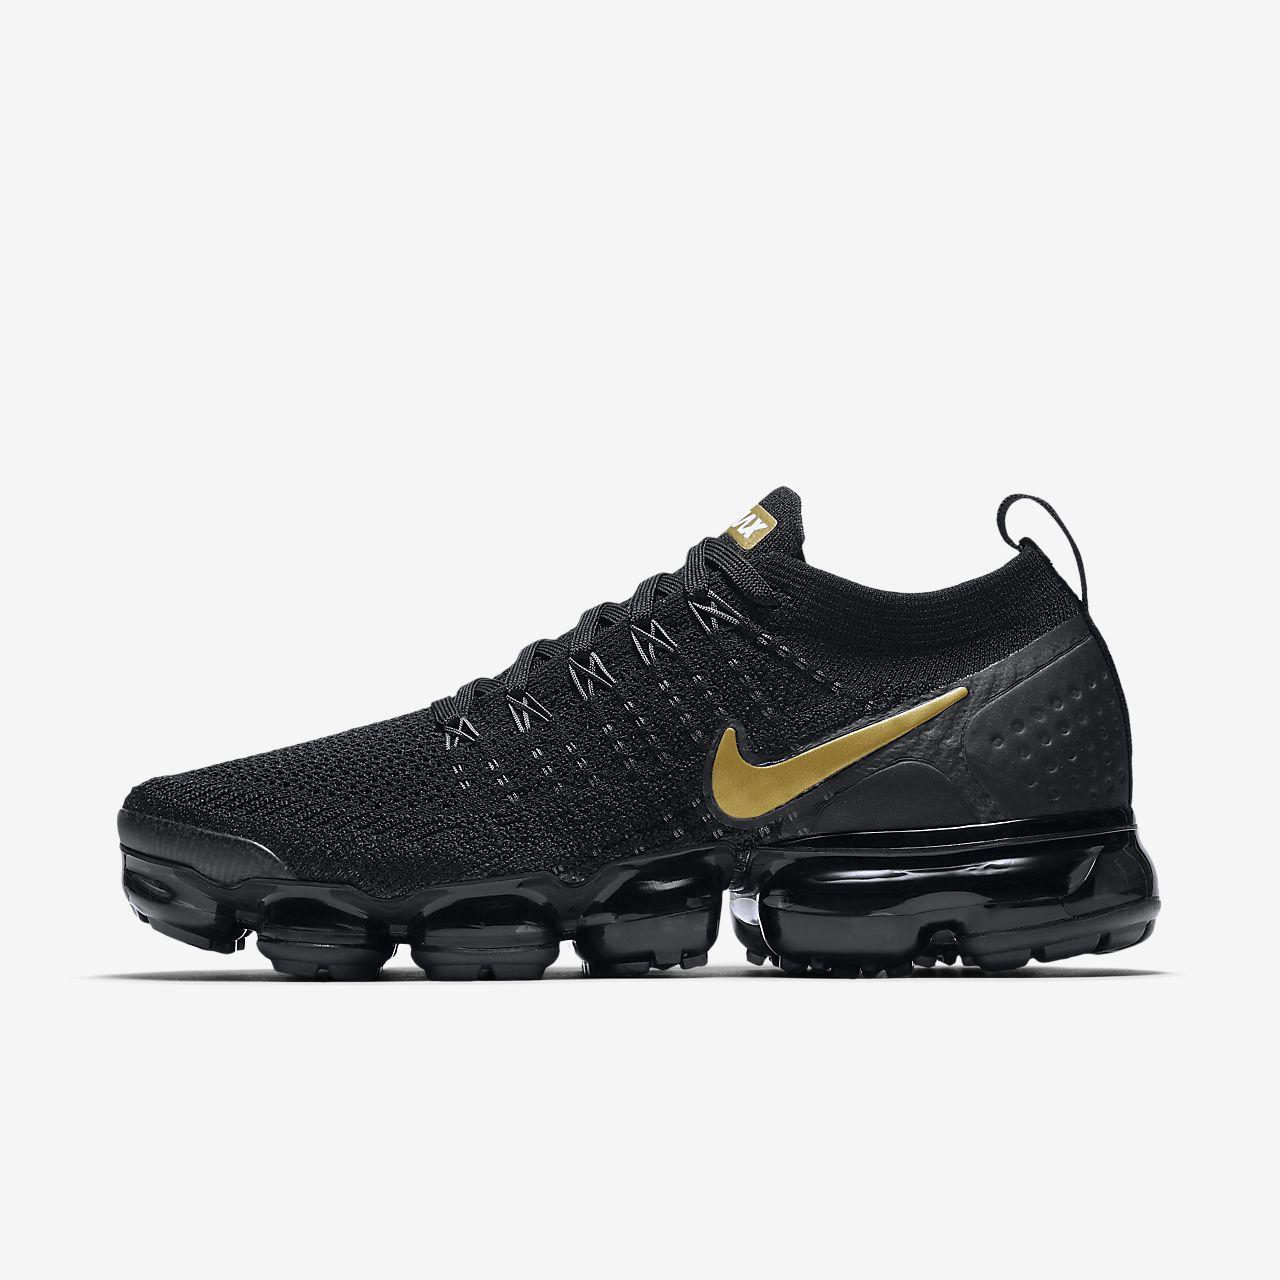 Air Nike Flyknit 2 Chaussure Pour Femme Vapormax hdxBtQsrC